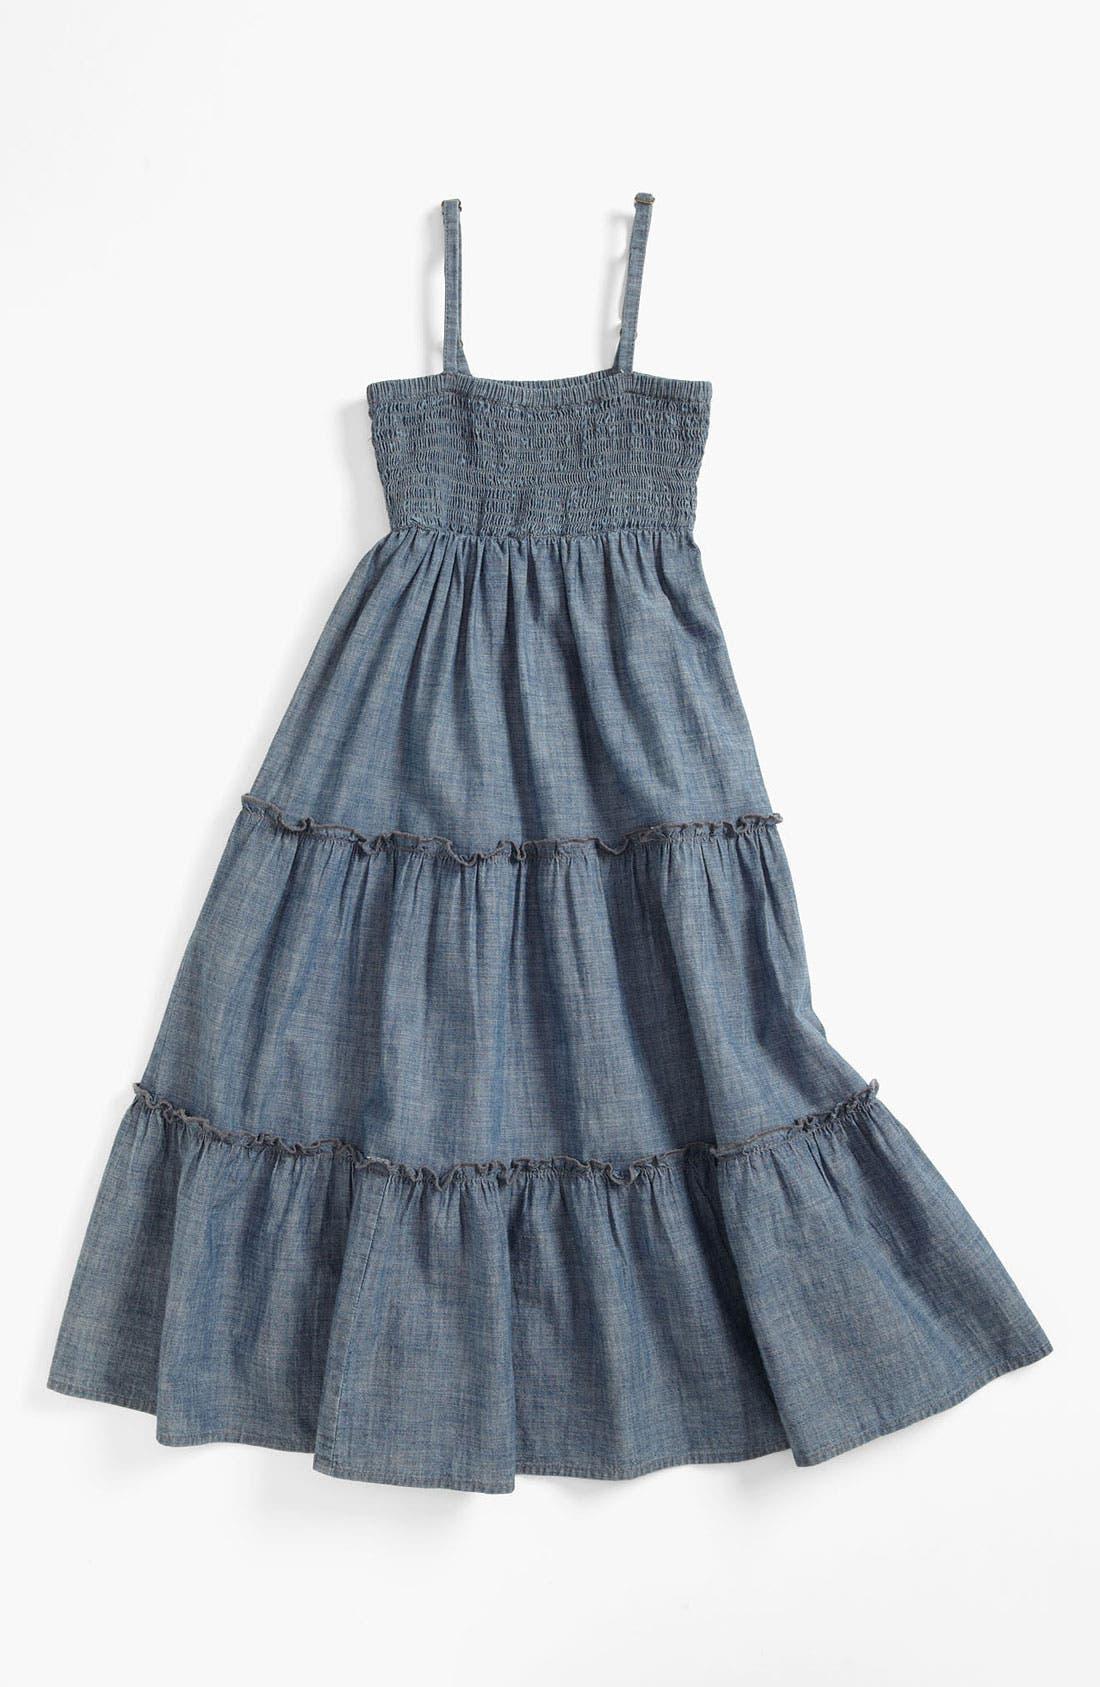 Alternate Image 1 Selected - Peek 'Emilia' Dress (Toddler, Little Girls & Big Girls)